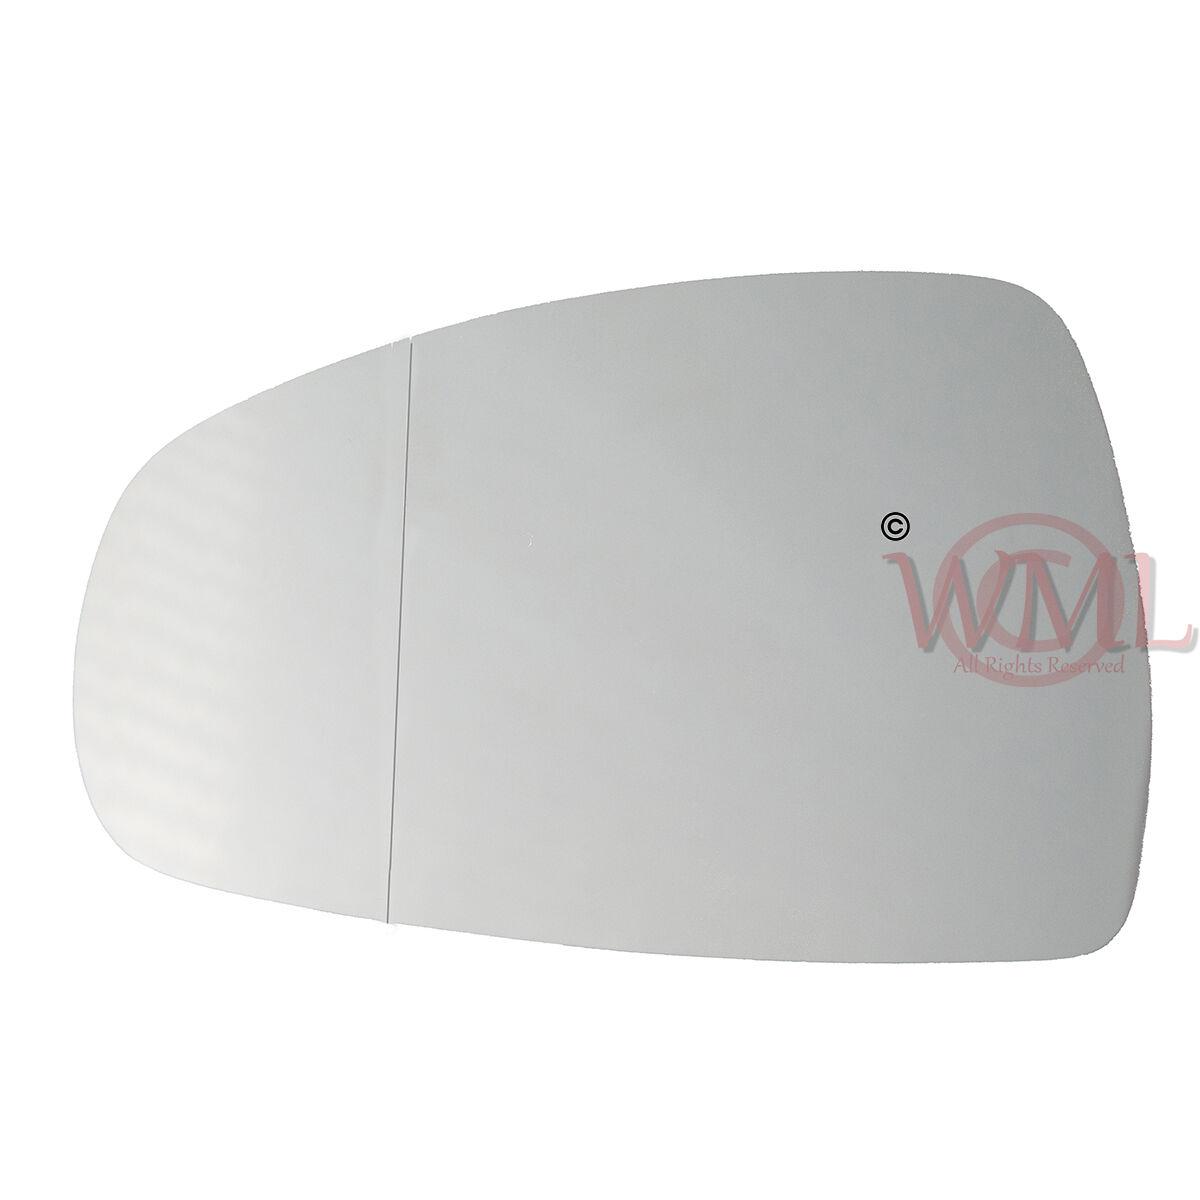 Wing mirror glass for AUDI A7 2010-2017 chauffant côté gauche convexe #A033